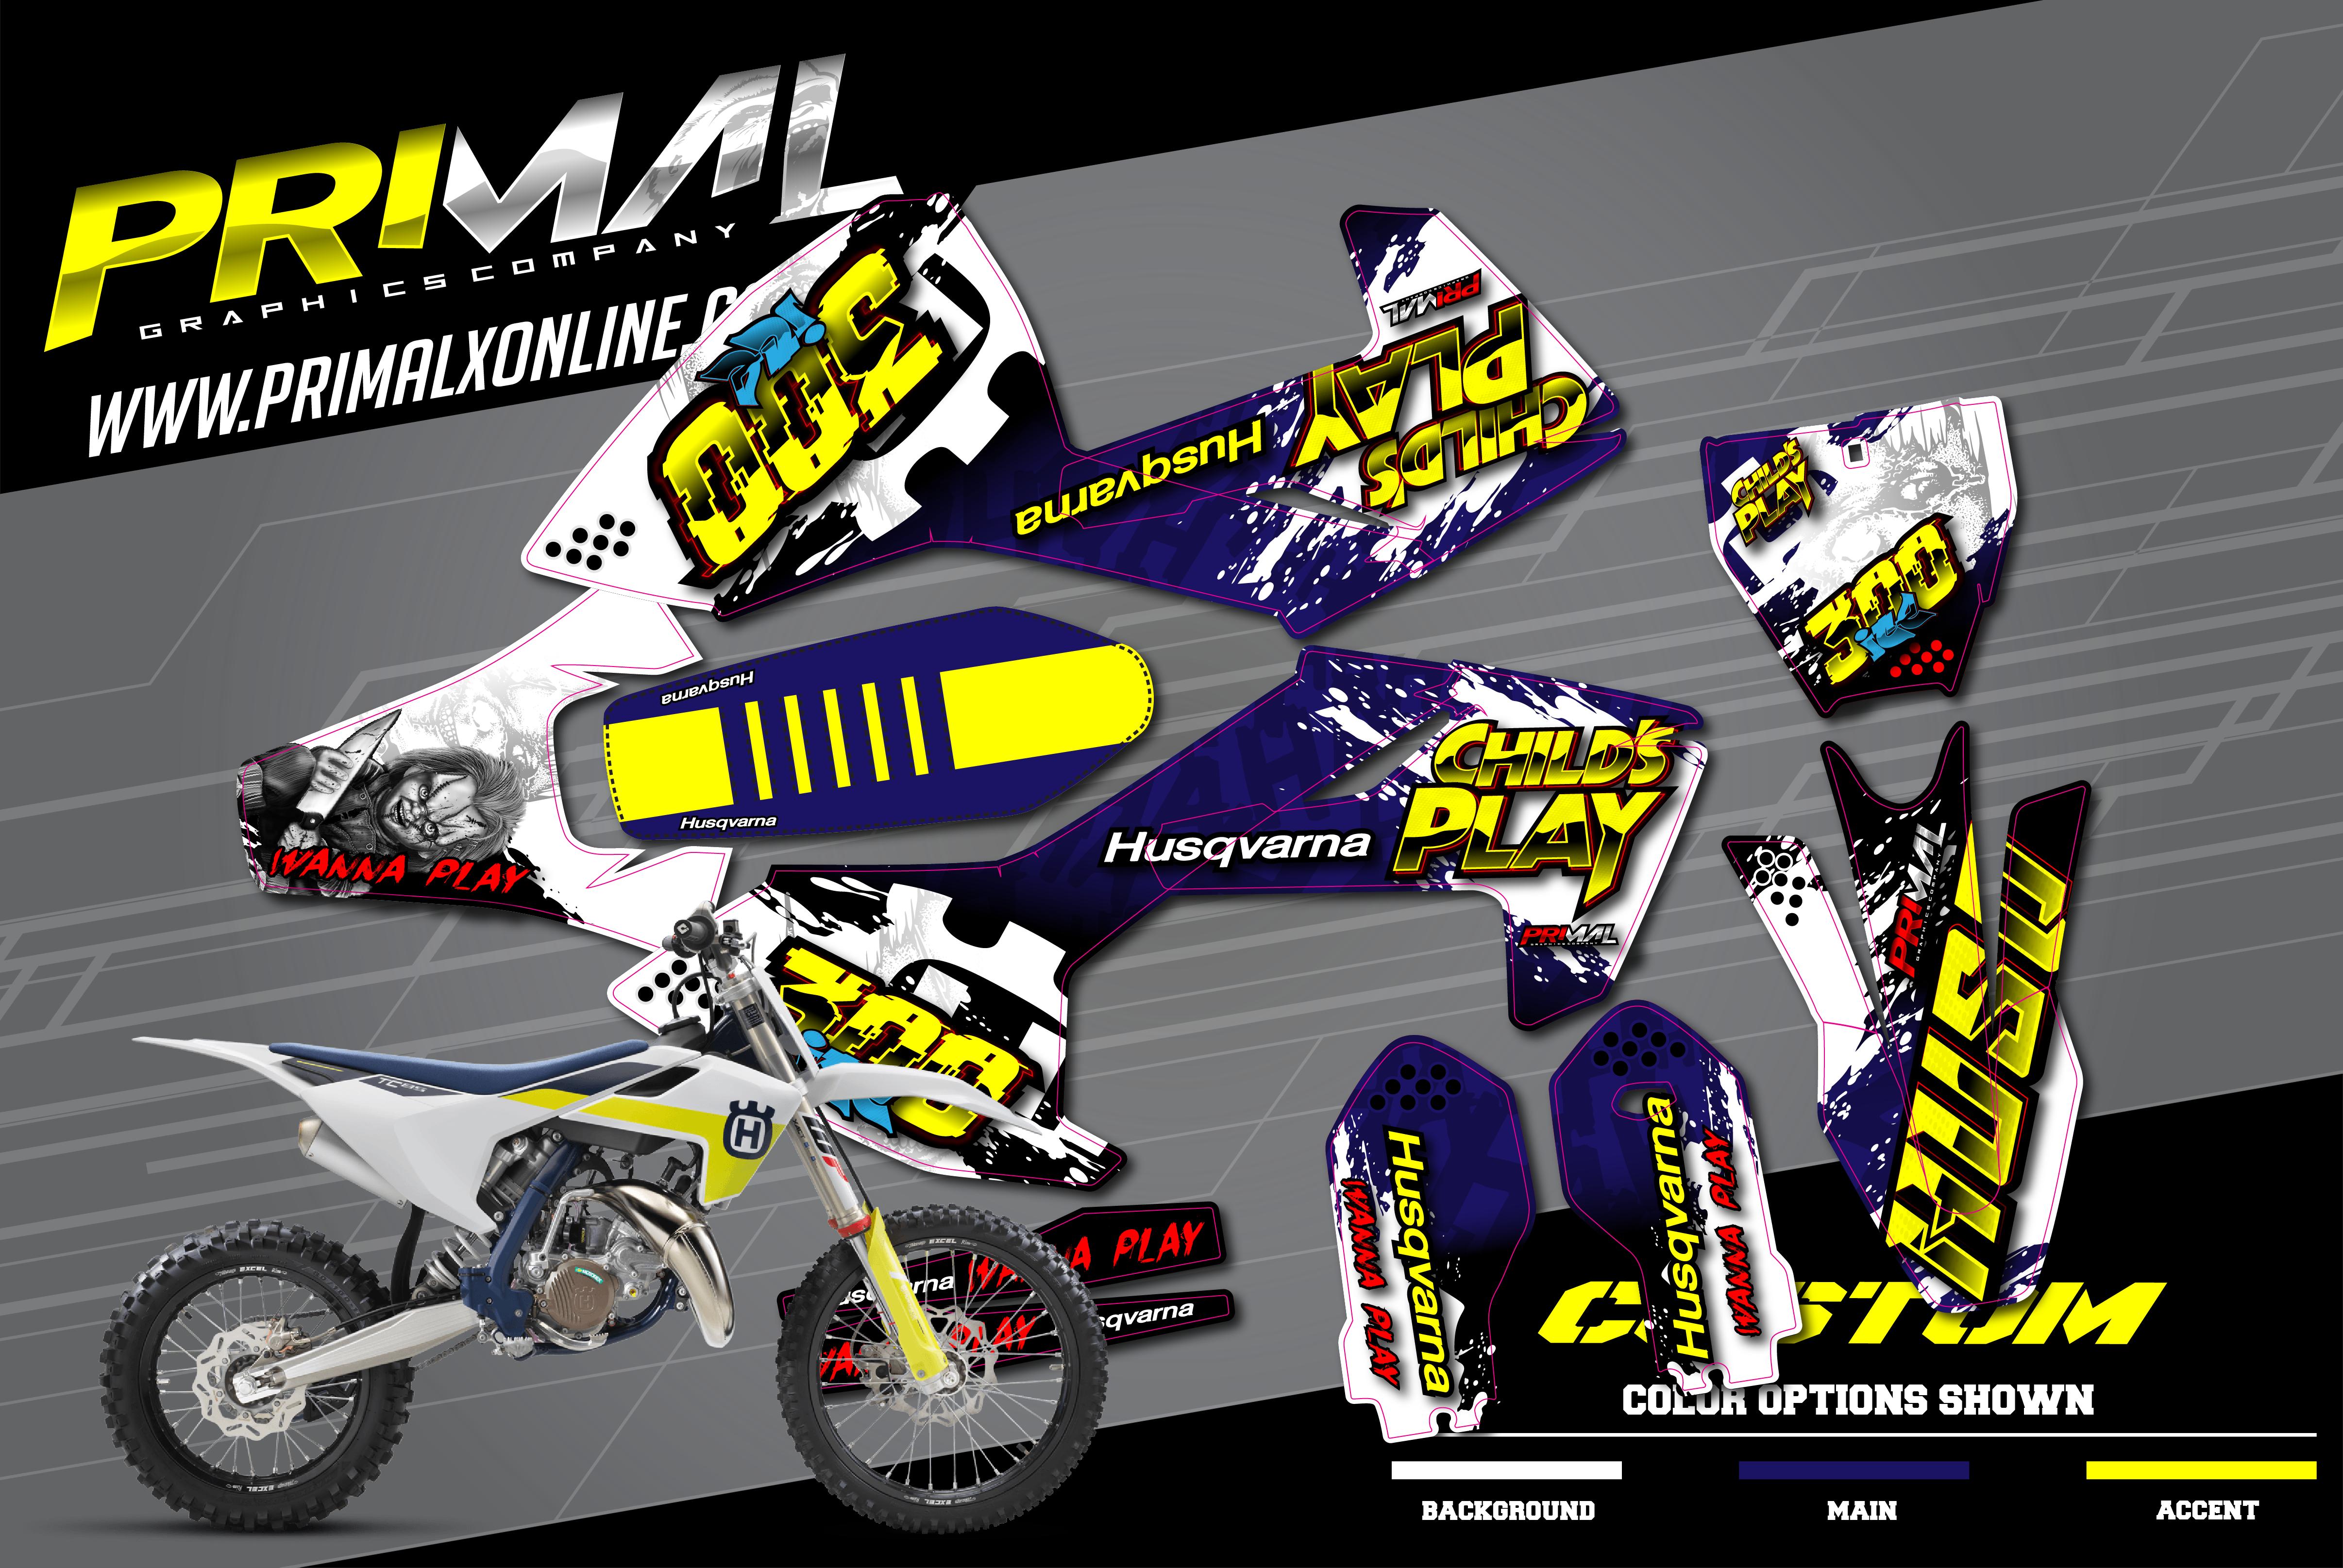 2_PRIMAL-X-MOTORSPORTS-PRIMAL-GRAPHICS-CO-HUSQVARNA-85-BIKELIFE-SERIES-MOTOCROSS-GRAPHICS-RETRO-PRIMAL-GFX-CO-MX-GRAPHICS-MX-DECALS-01-01-01